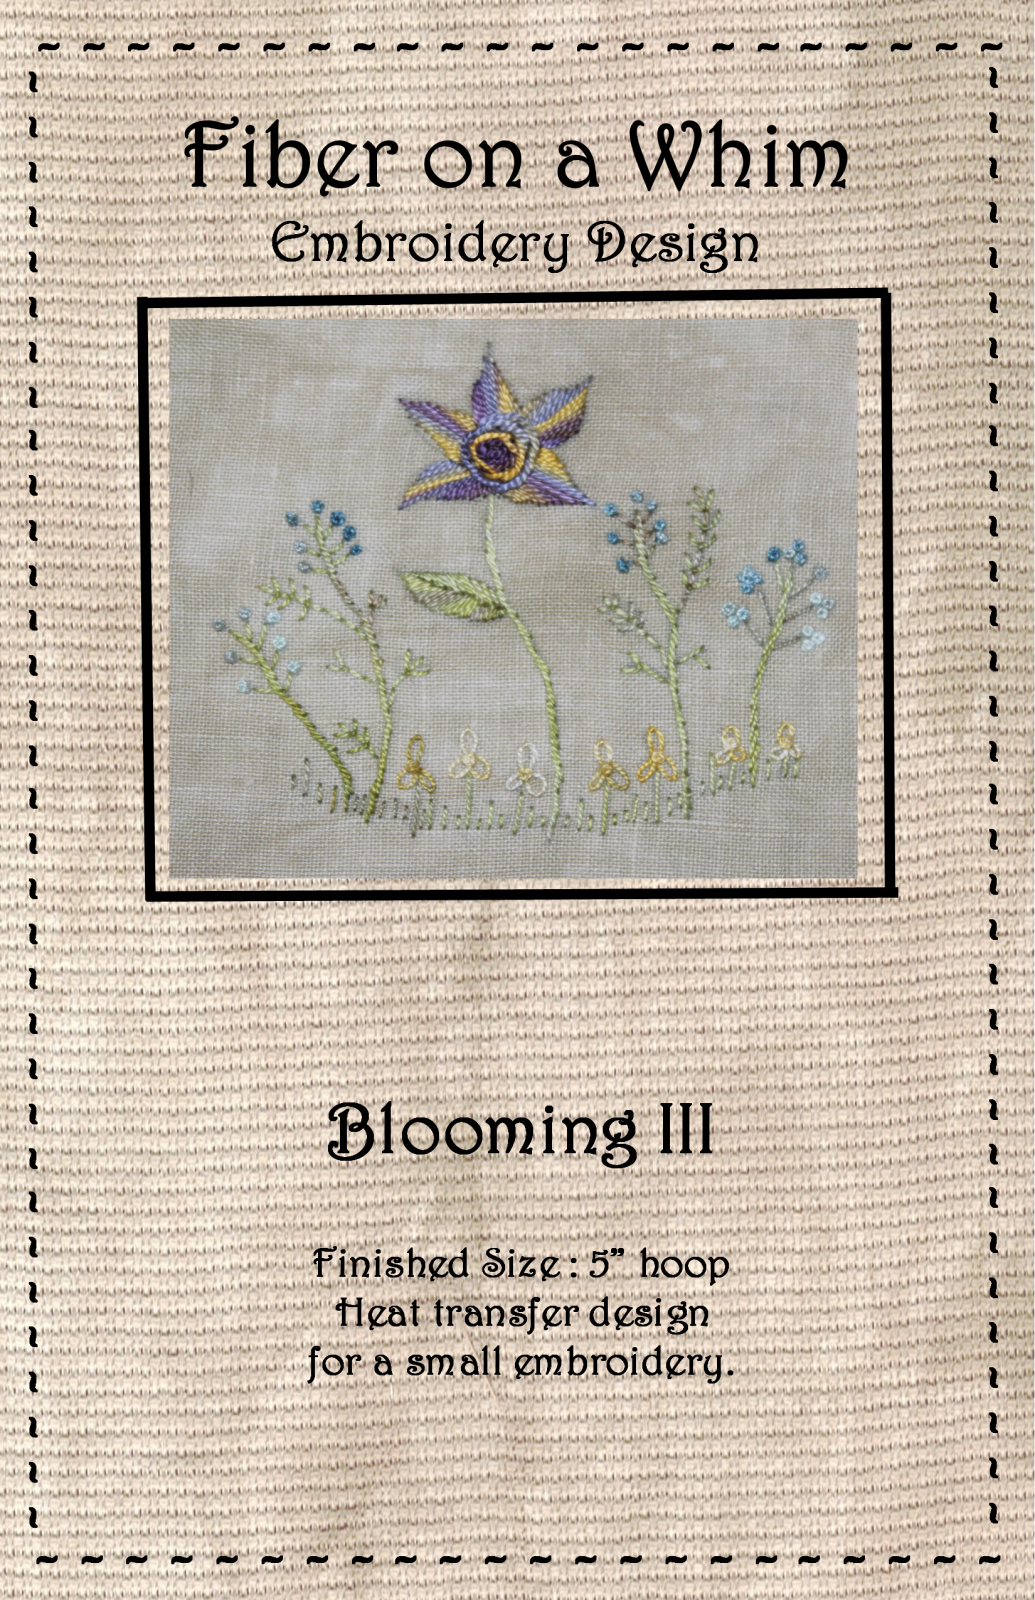 Blooming III Heat Transfer Design